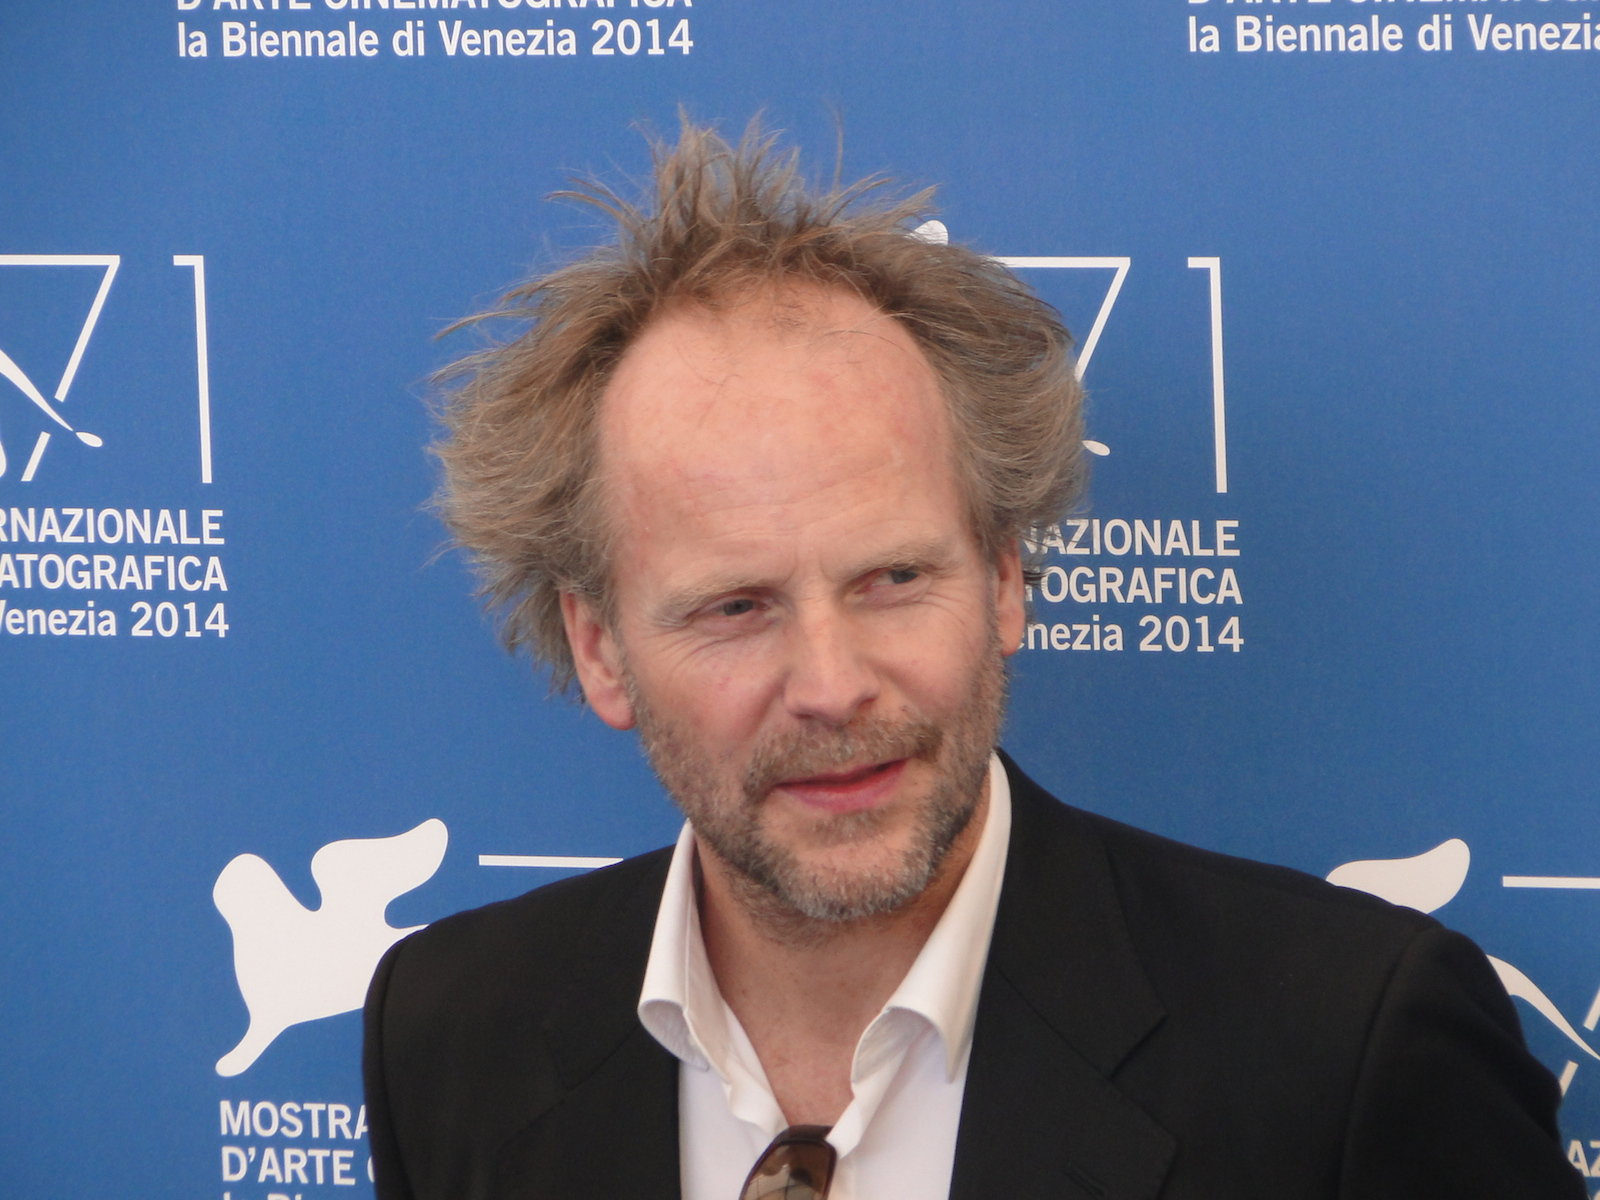 Venezia 2014: Philip Gröning i giurati di Venezia 71